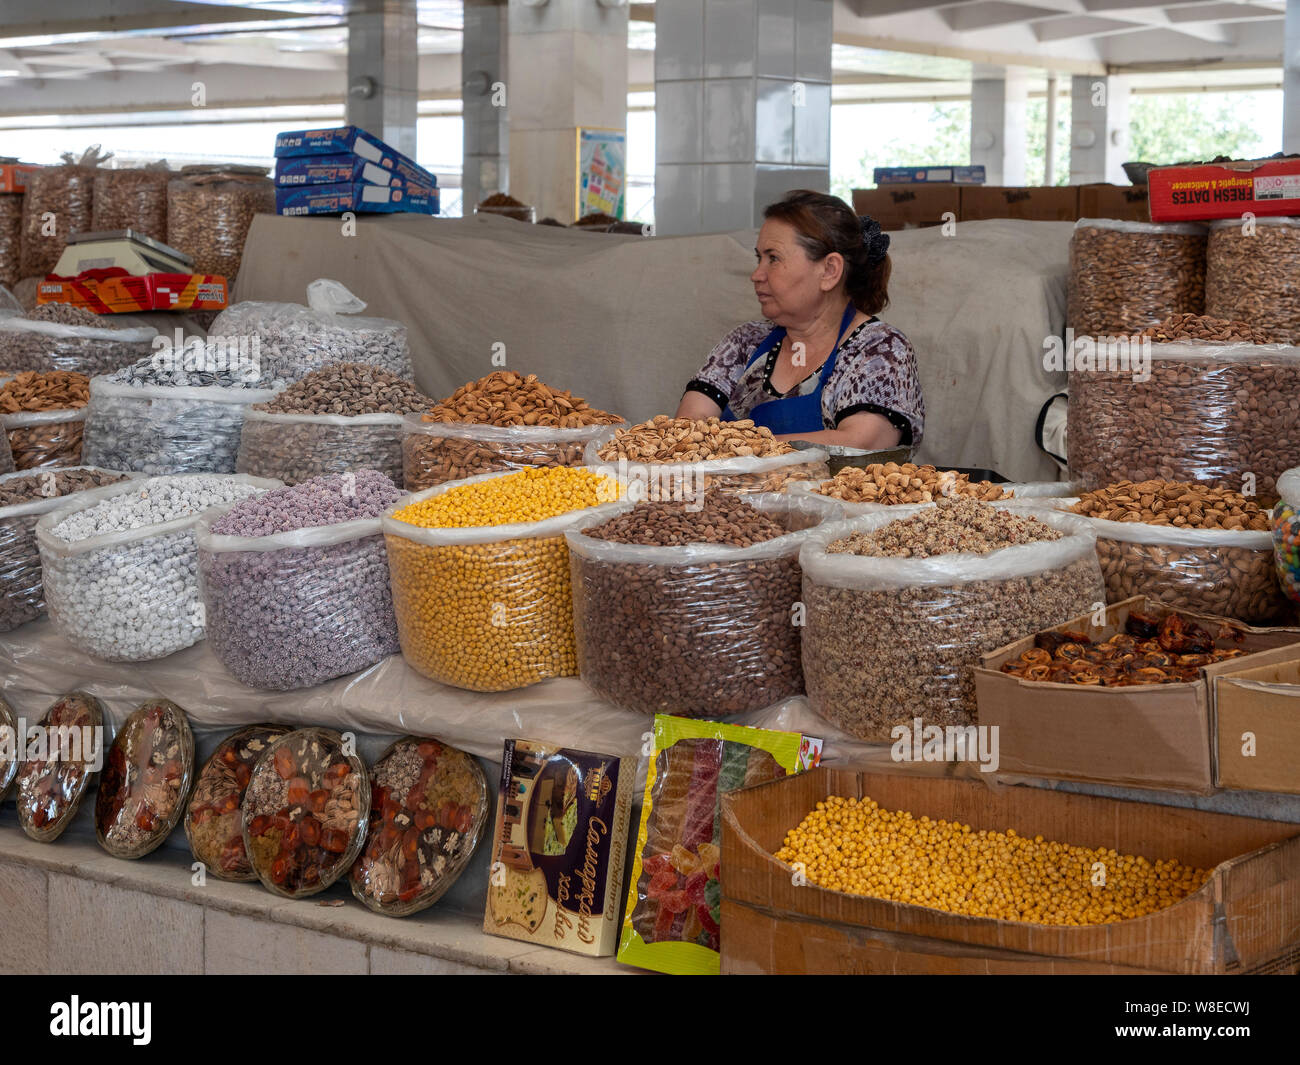 Auf dem Basar, Samarkand, Usbekistan, Asien  Bazaar in Samarkand, Uzbekistan, Asia Stock Photo